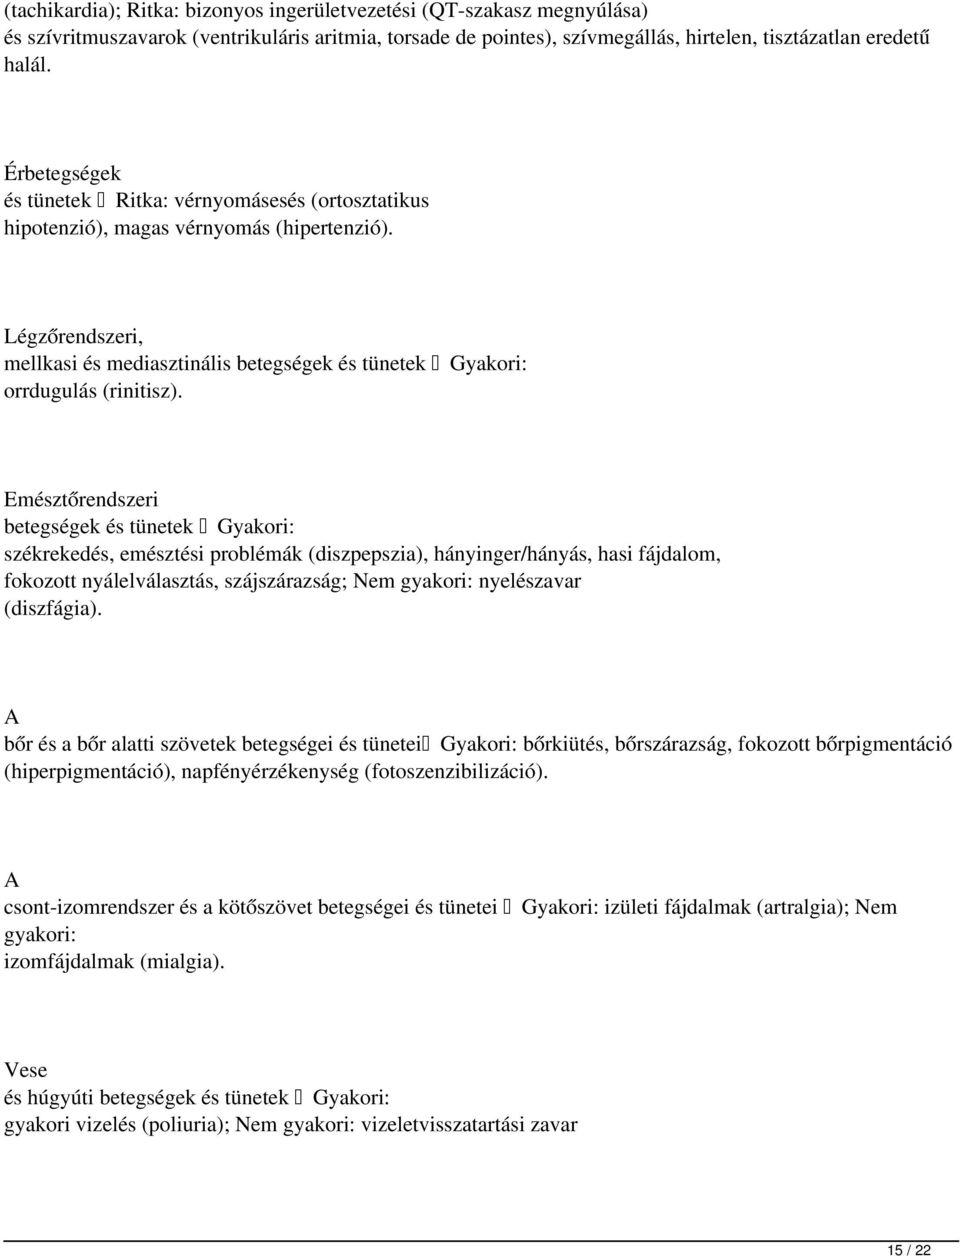 suprastin magas vérnyomás esetén)